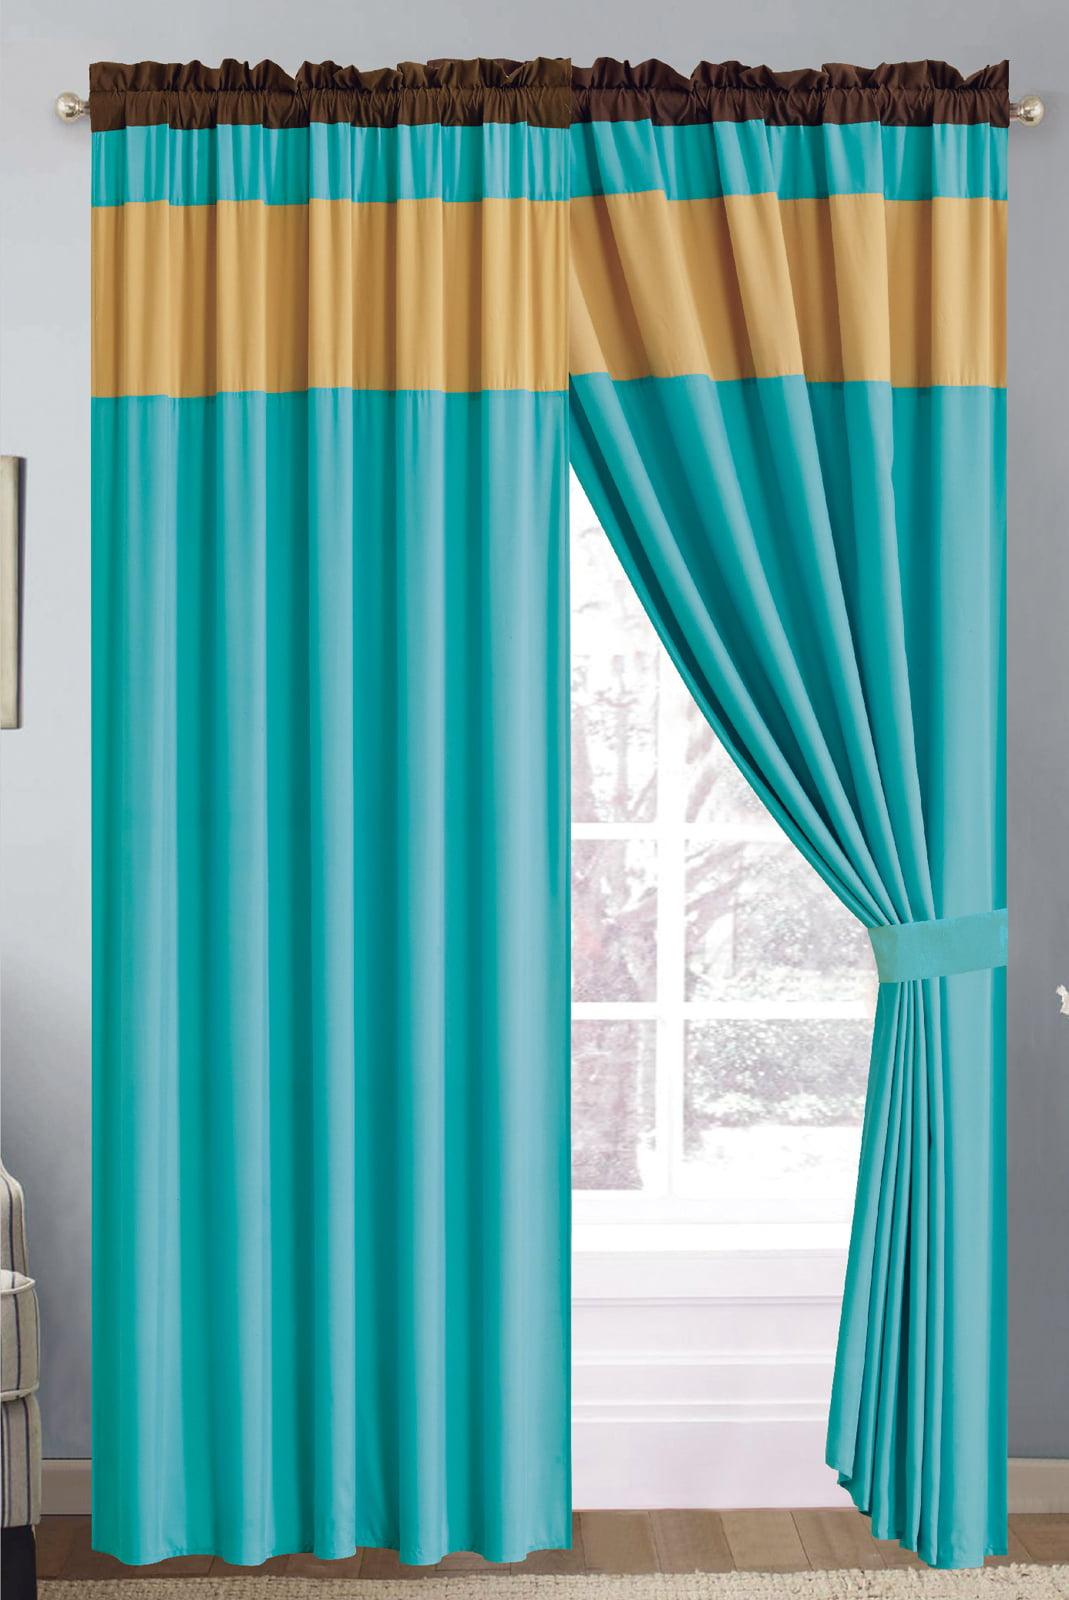 4 Pc Chic Solid Striped Curtain Set Turquoise Blue Gold Brown Sheer Liner Drape Rod Pocket Walmart Com Walmart Com